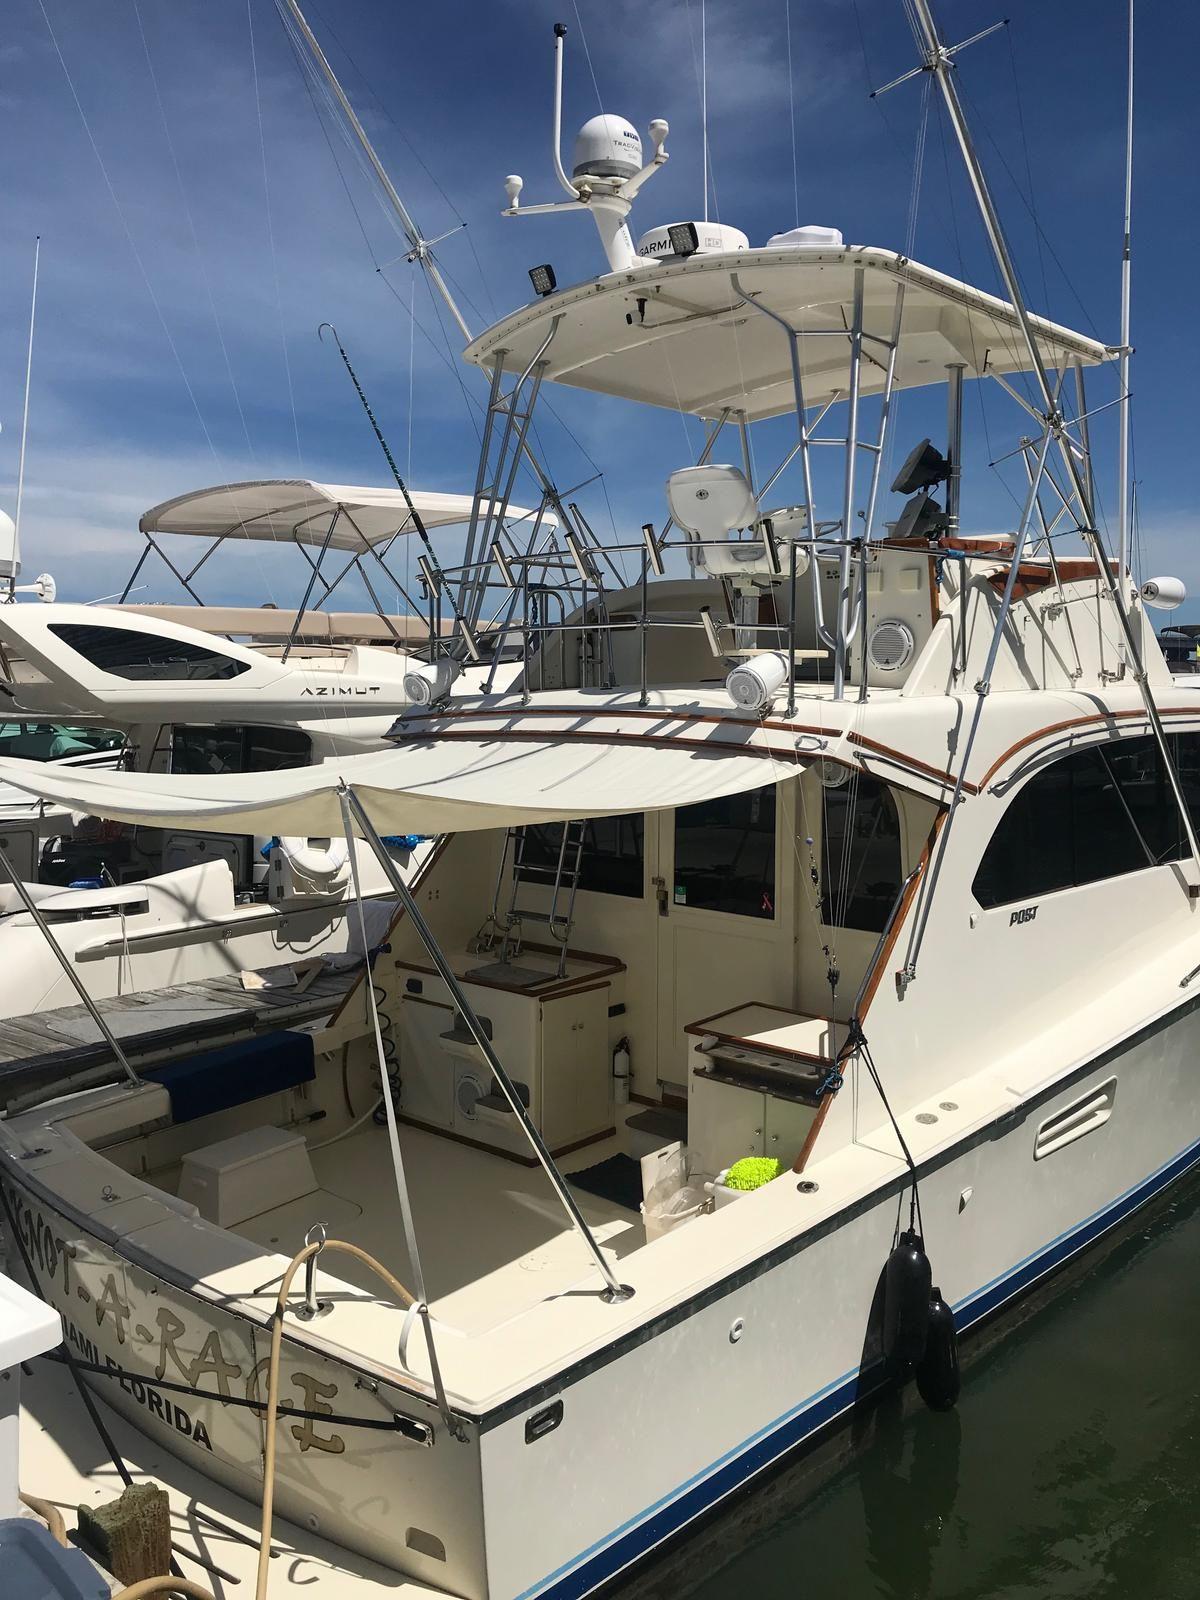 1986 Used Post Sport Fish Sports Fishing Boat For Sale 88 950 Miami Beach Fl Moreboats Com